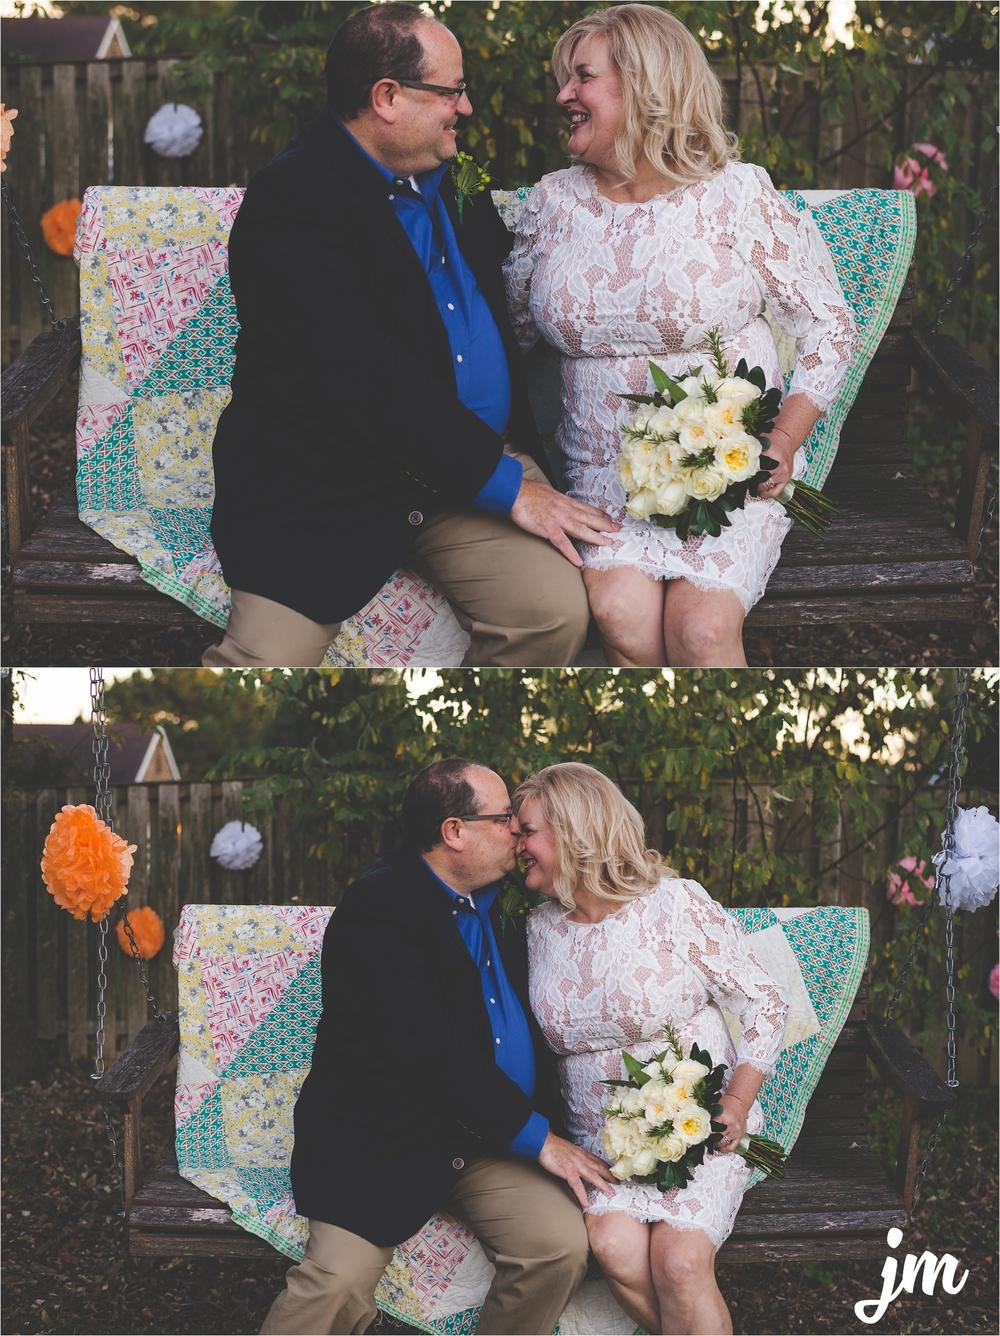 backyard-wedding-pacific-northwest-photographer-jannicka-mayte_0036.jpg